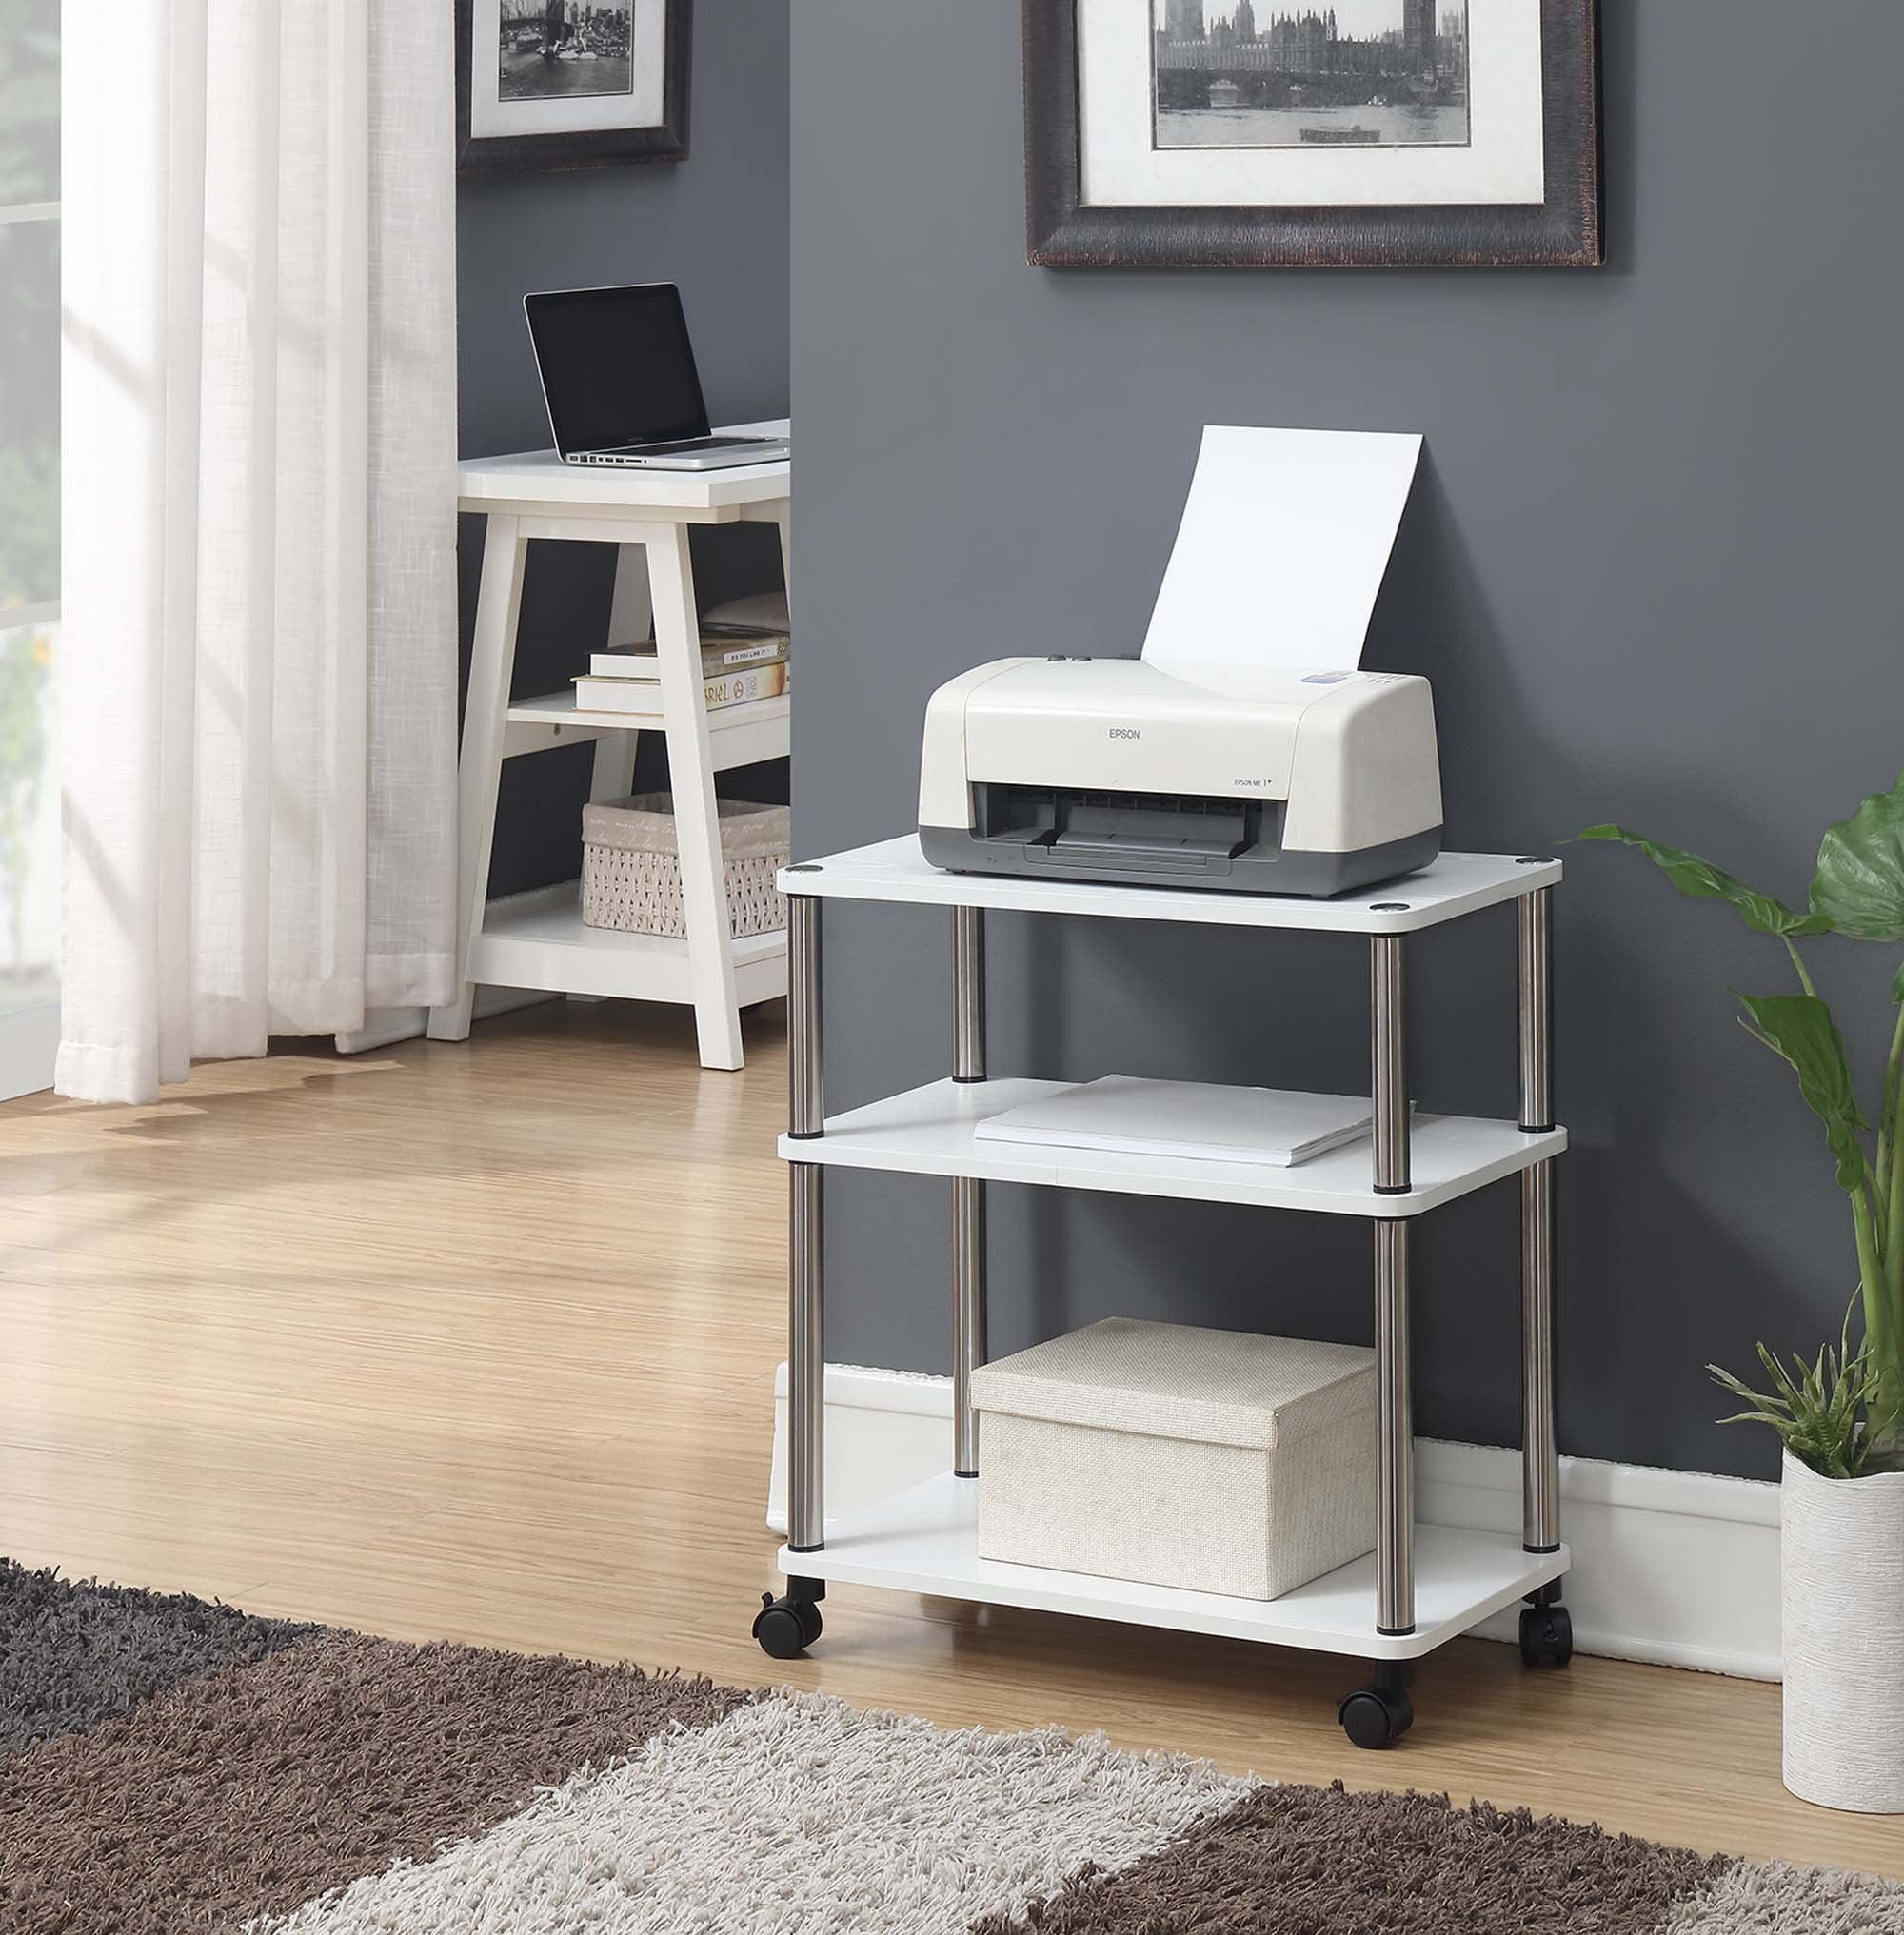 Convenience Concepts Designs-2-Go Office Caddy